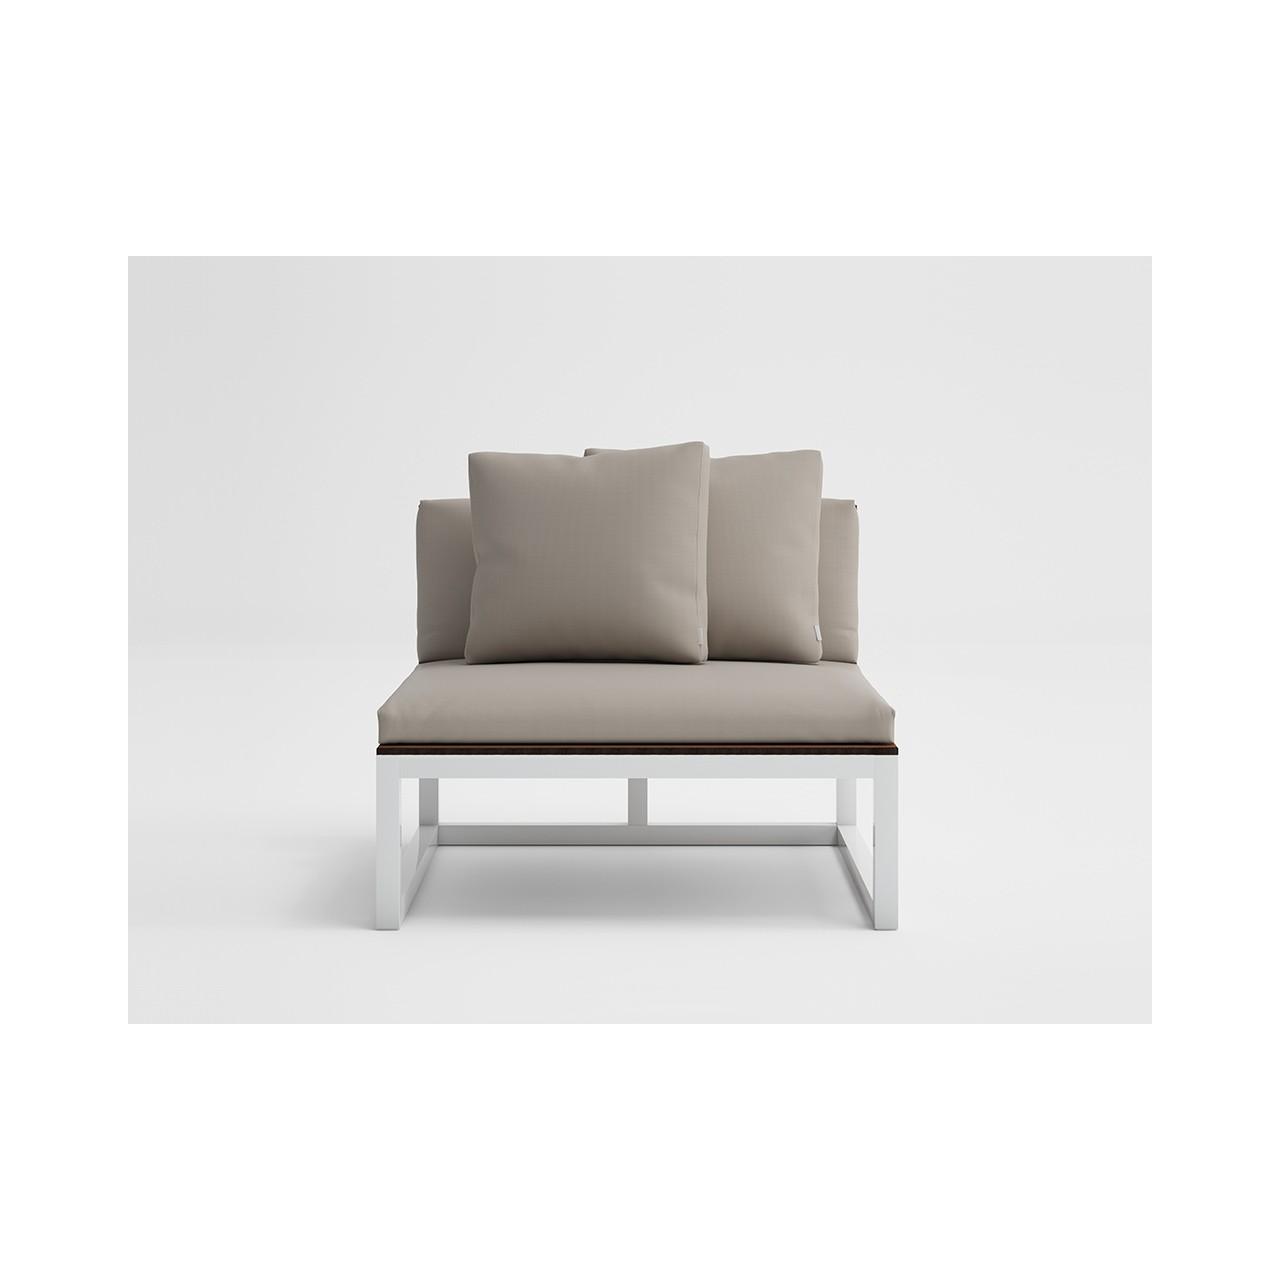 Saler Soft Teak - Modular Sofa 3 Mattress